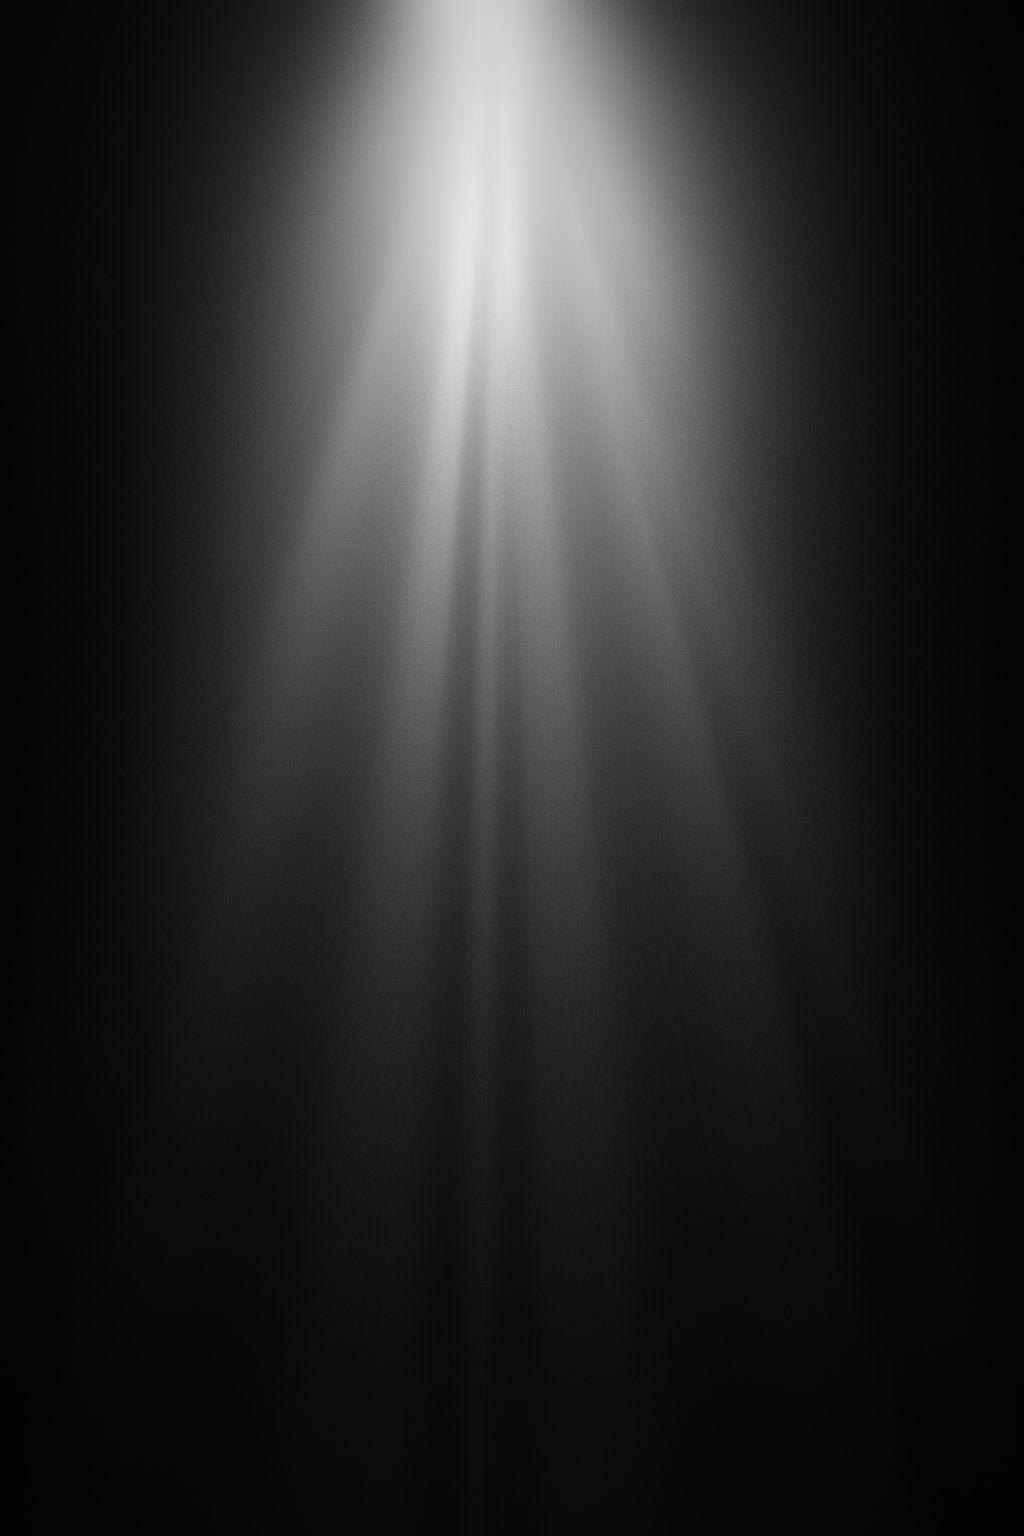 Heavenly Light Light Background Images Black Background Wallpaper Black Background Images